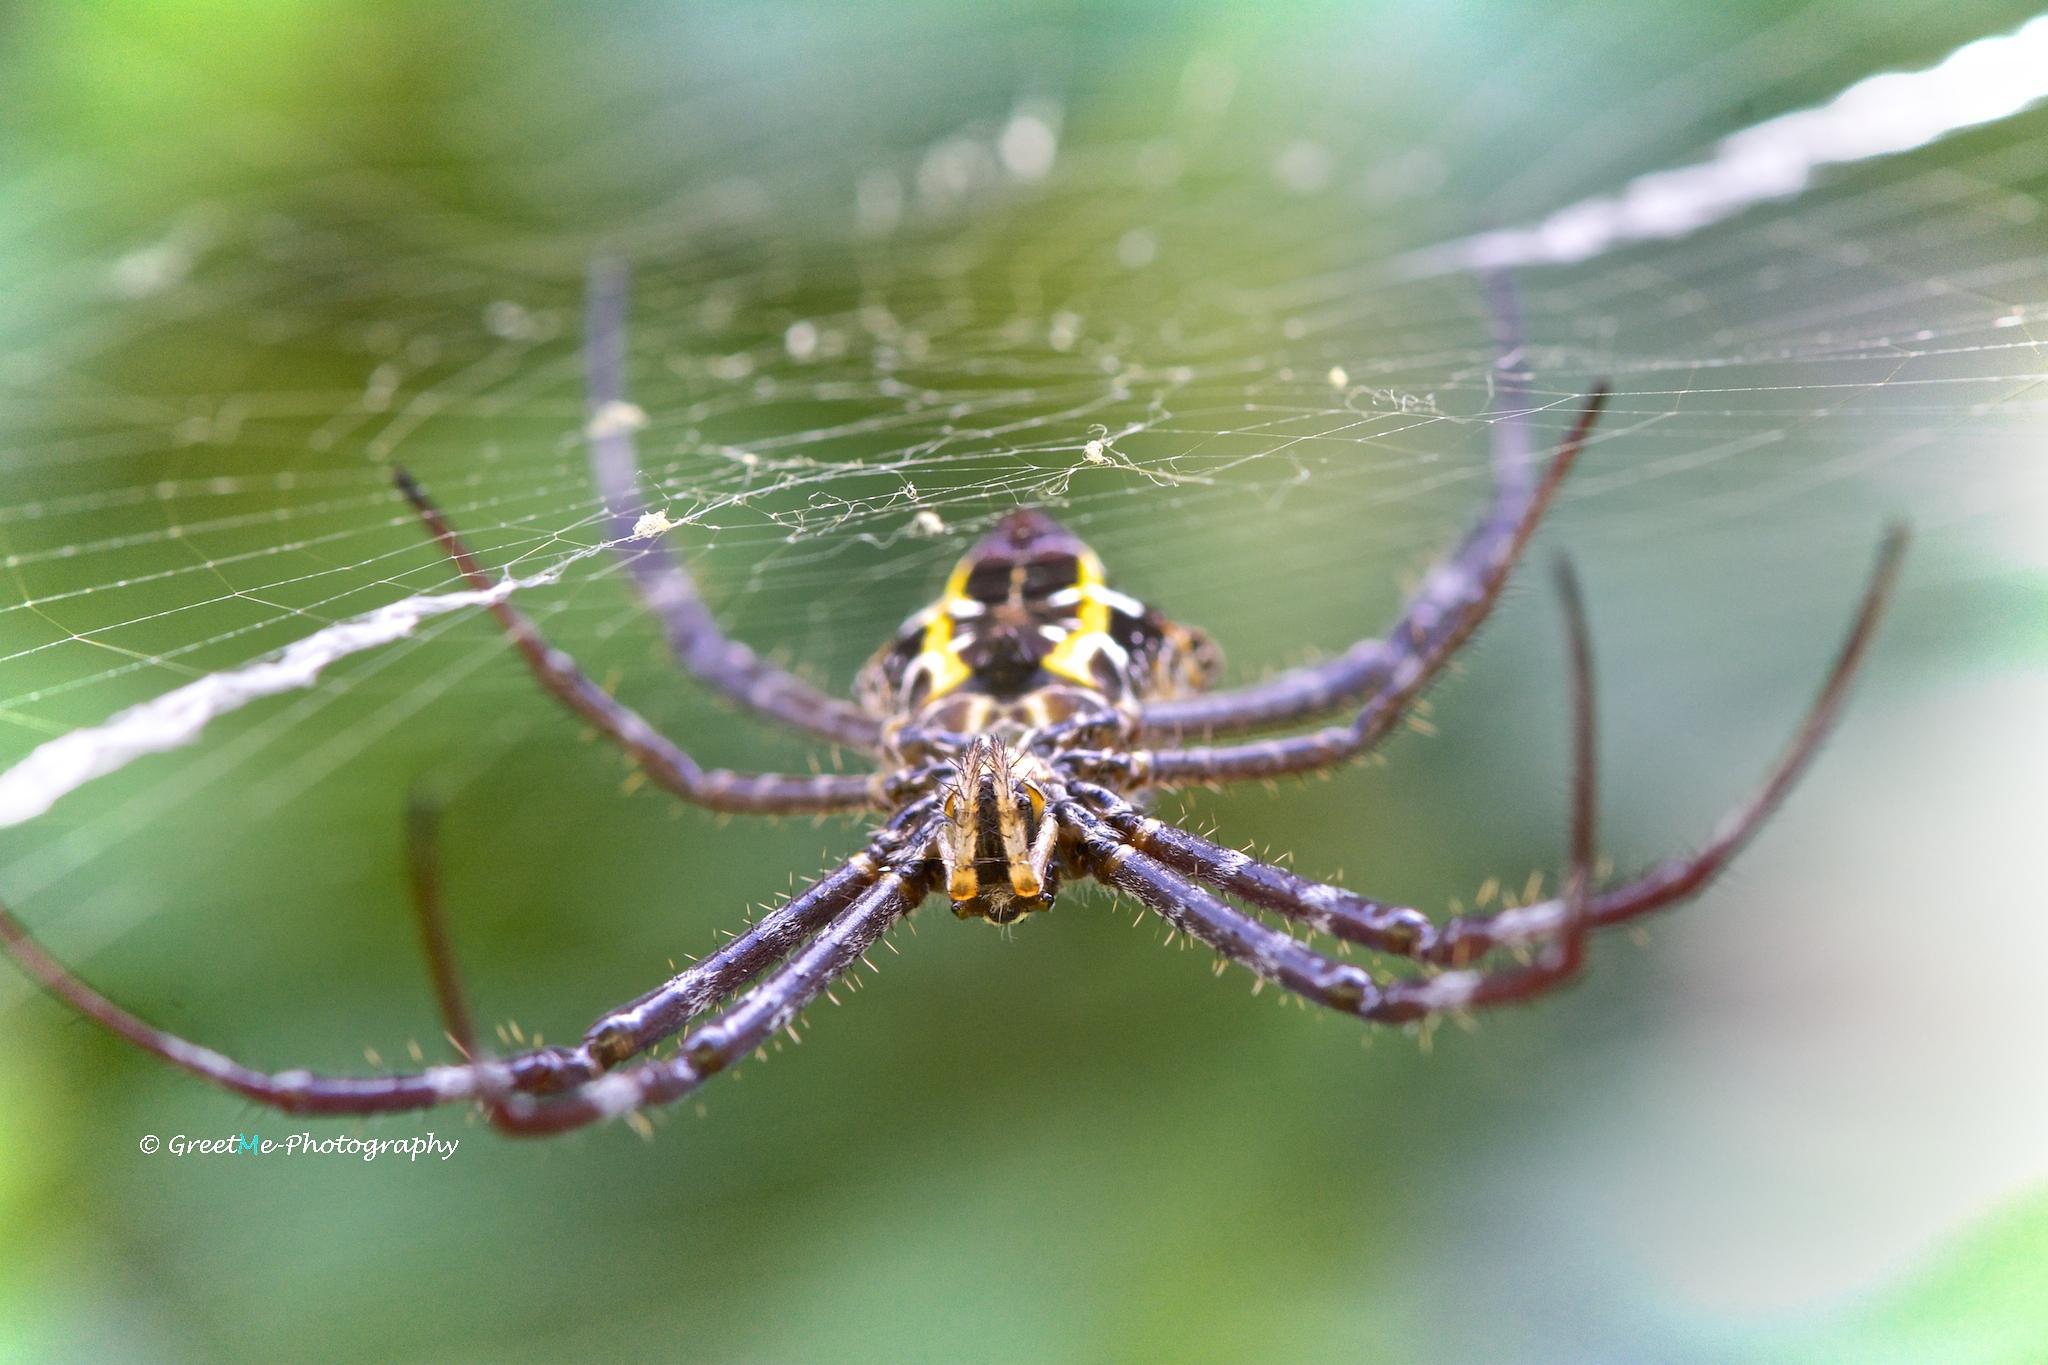 Orb-weaver spider by Stills - by Greet Meulepas